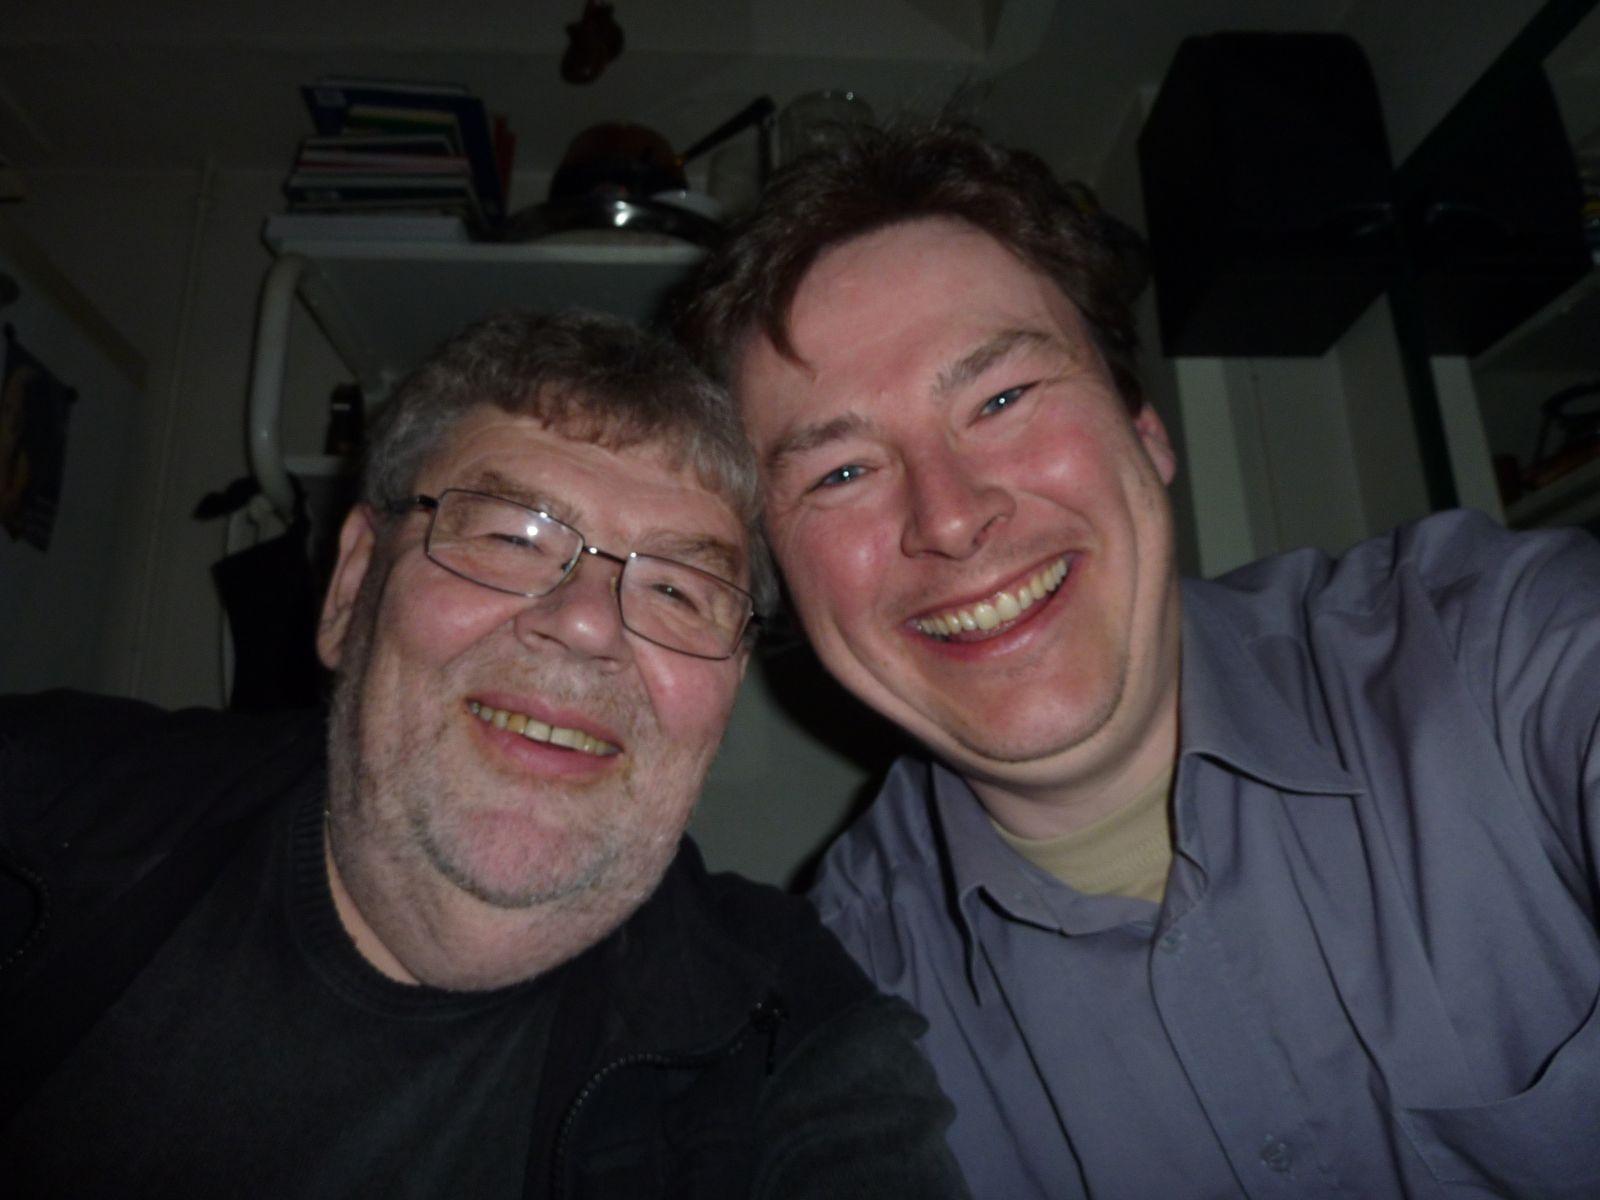 2010-03-13-1824_-_Gert; Søren Labansen_3